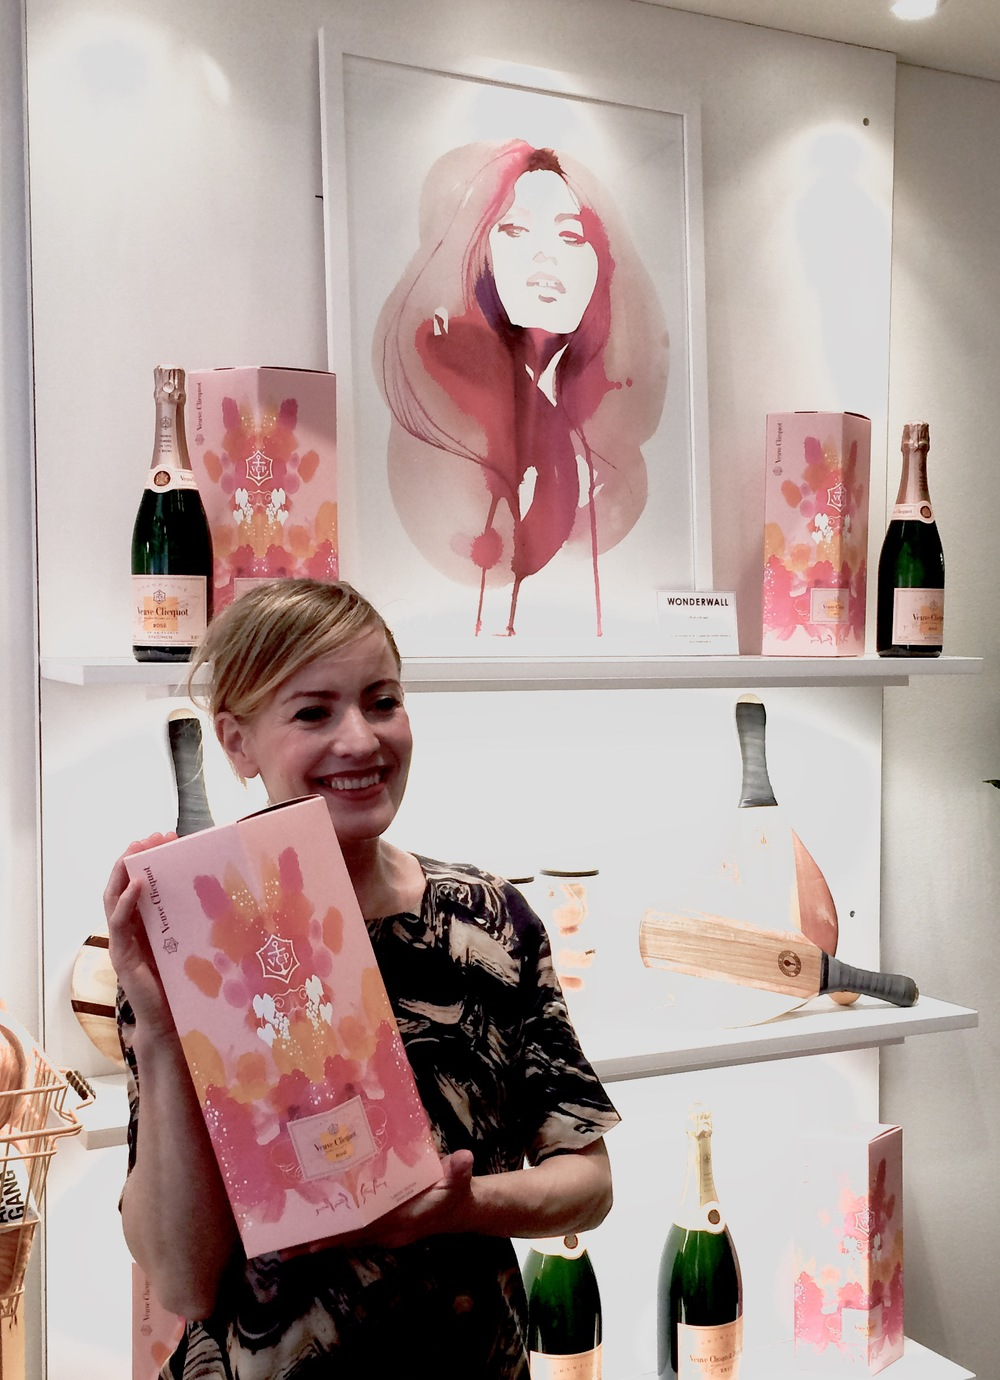 Stina Persson / Veuve Clicquot Pop-up Shop